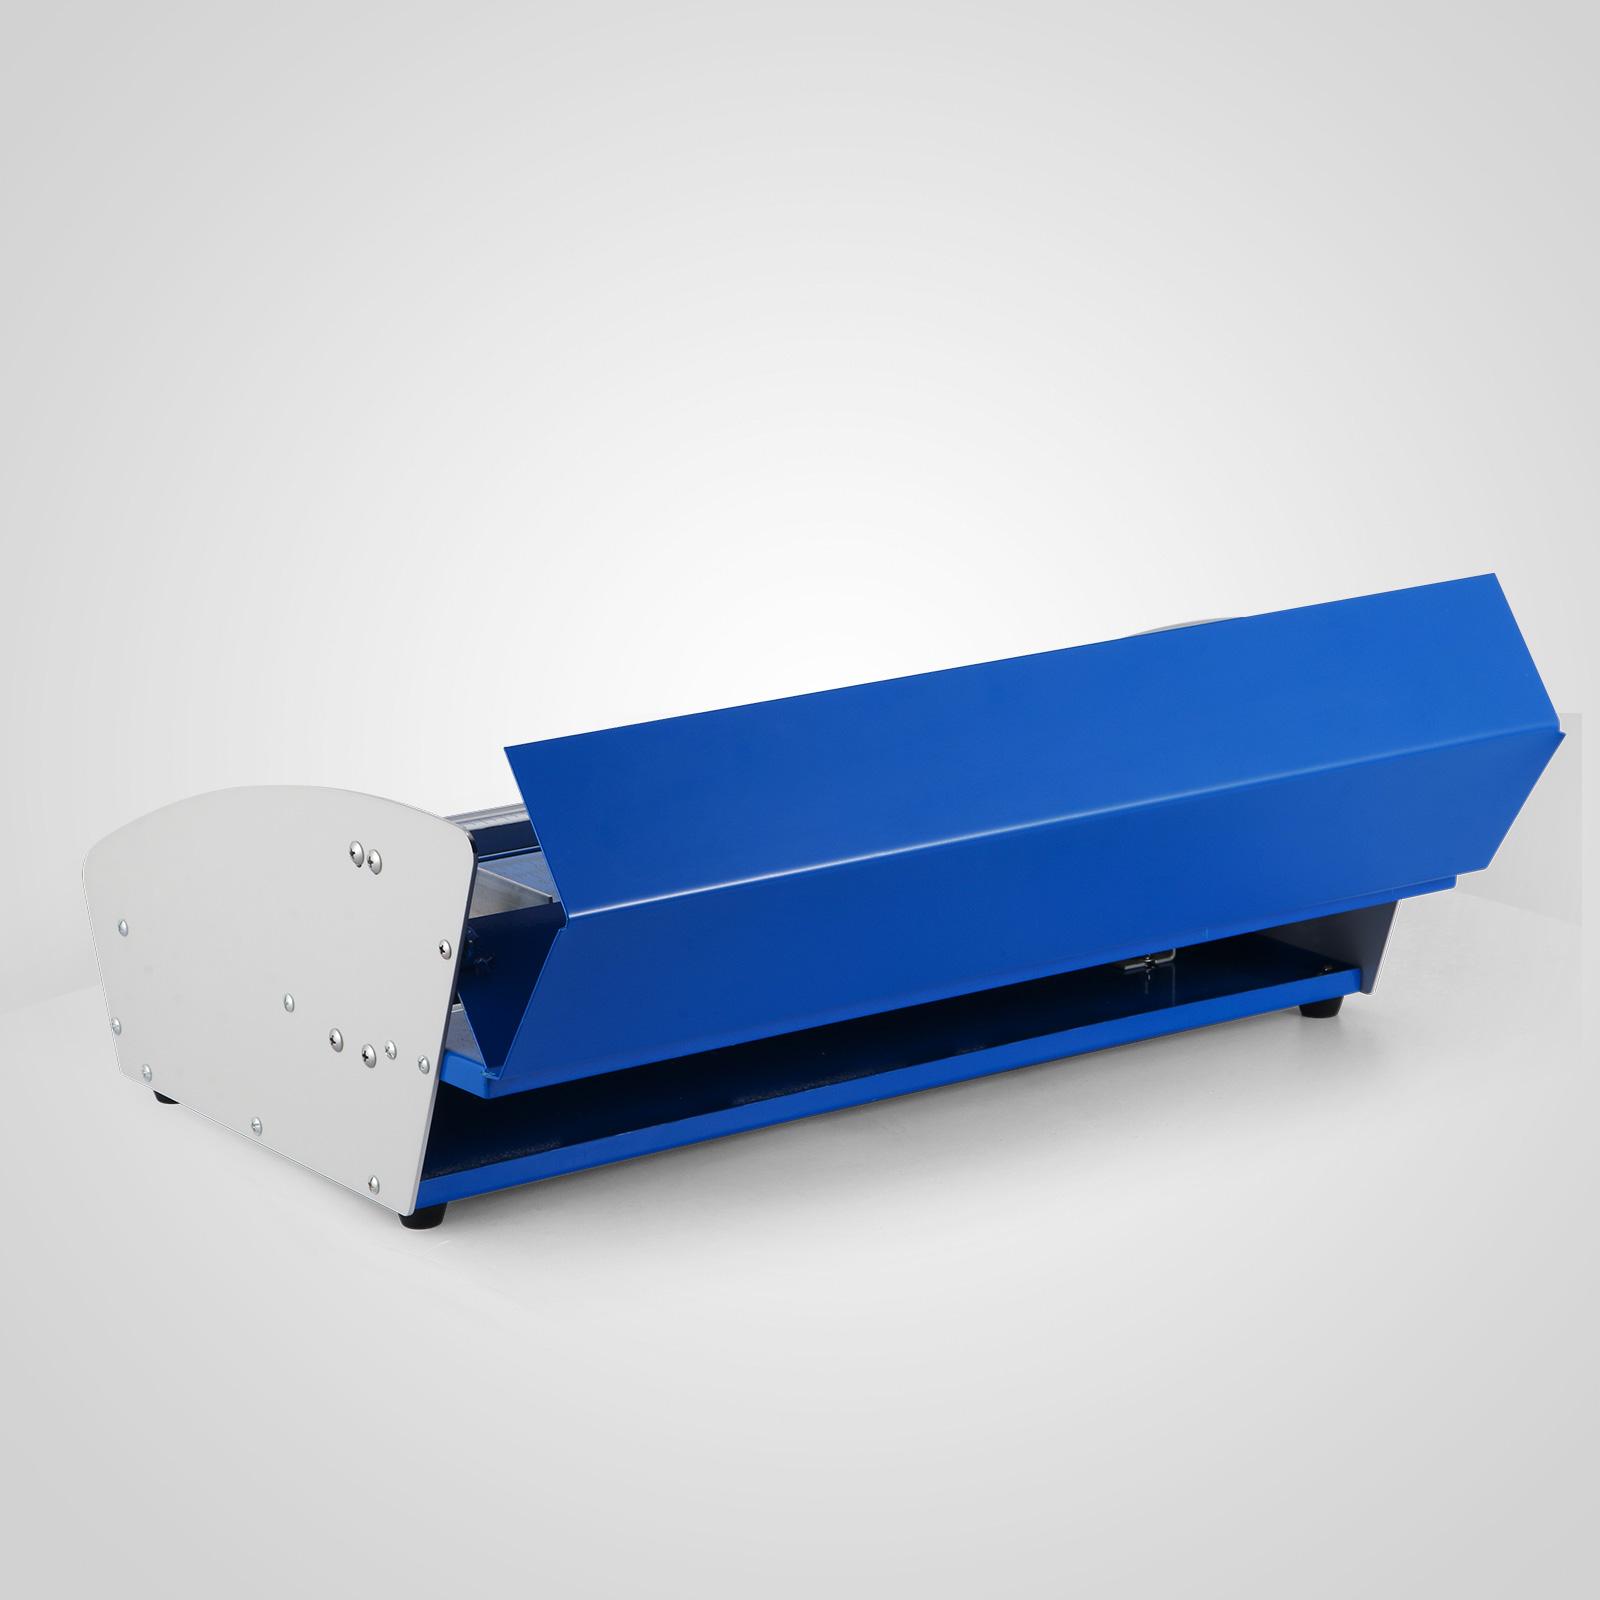 Cordonatrice-Perforatrice-Max-350-520mm-Profondita-Regolabile-Elettrica-Manuale miniatura 32